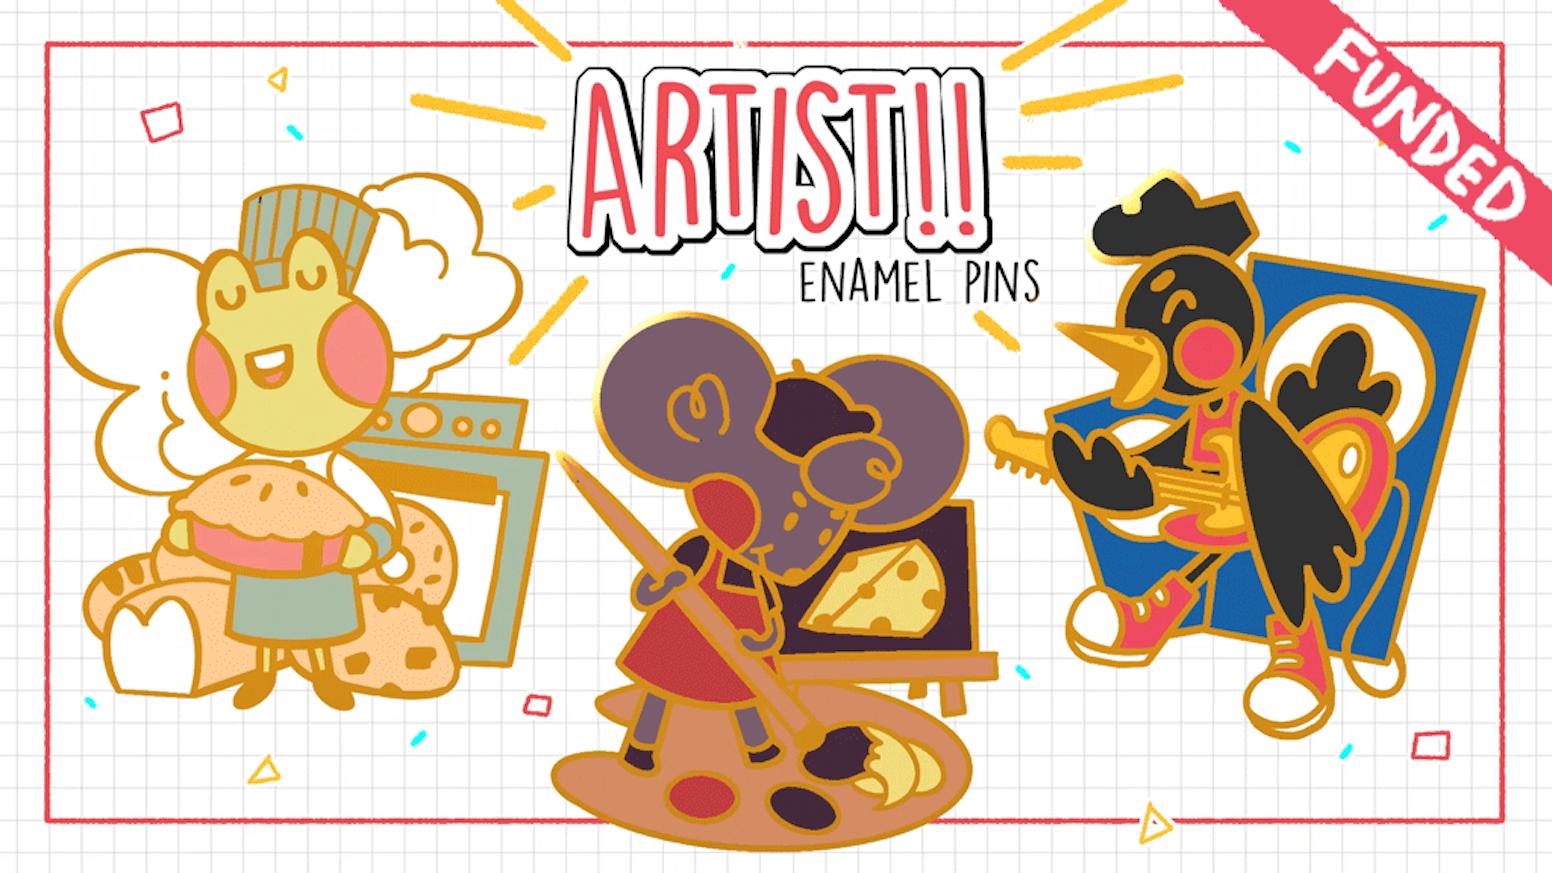 ARTIST!! Enamel Pins by mon! — Kickstarter